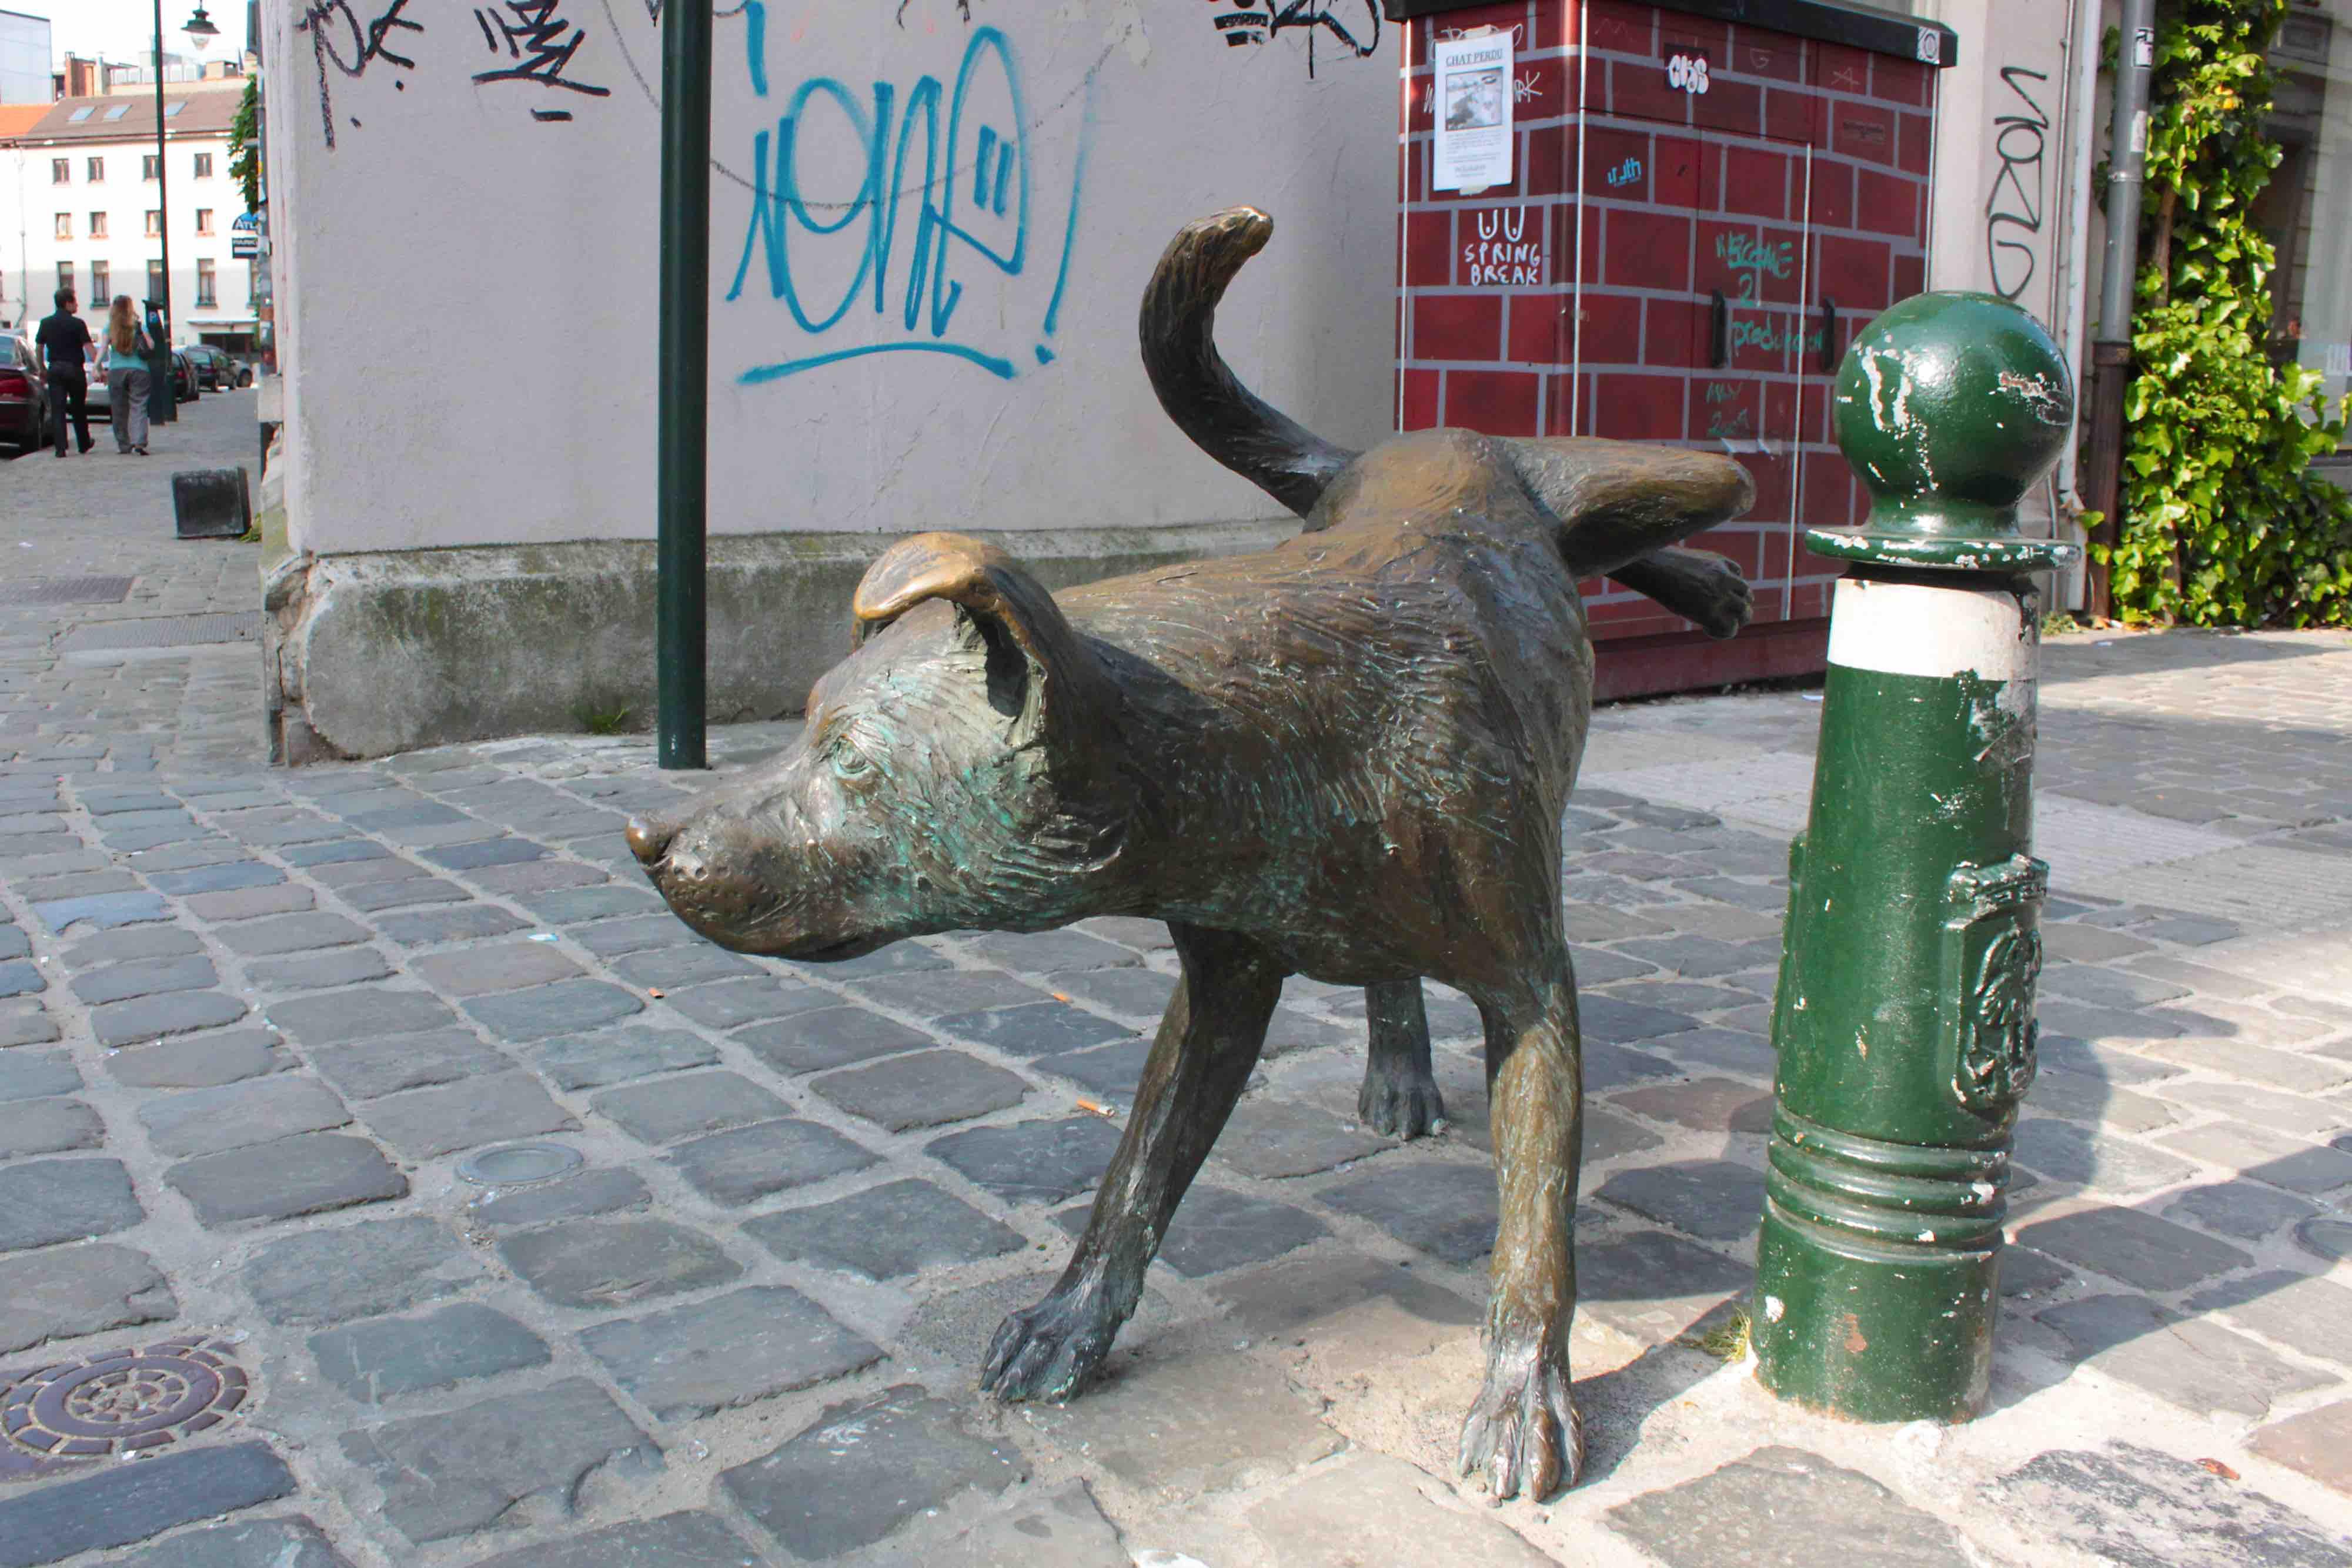 Belgian peeing statue are